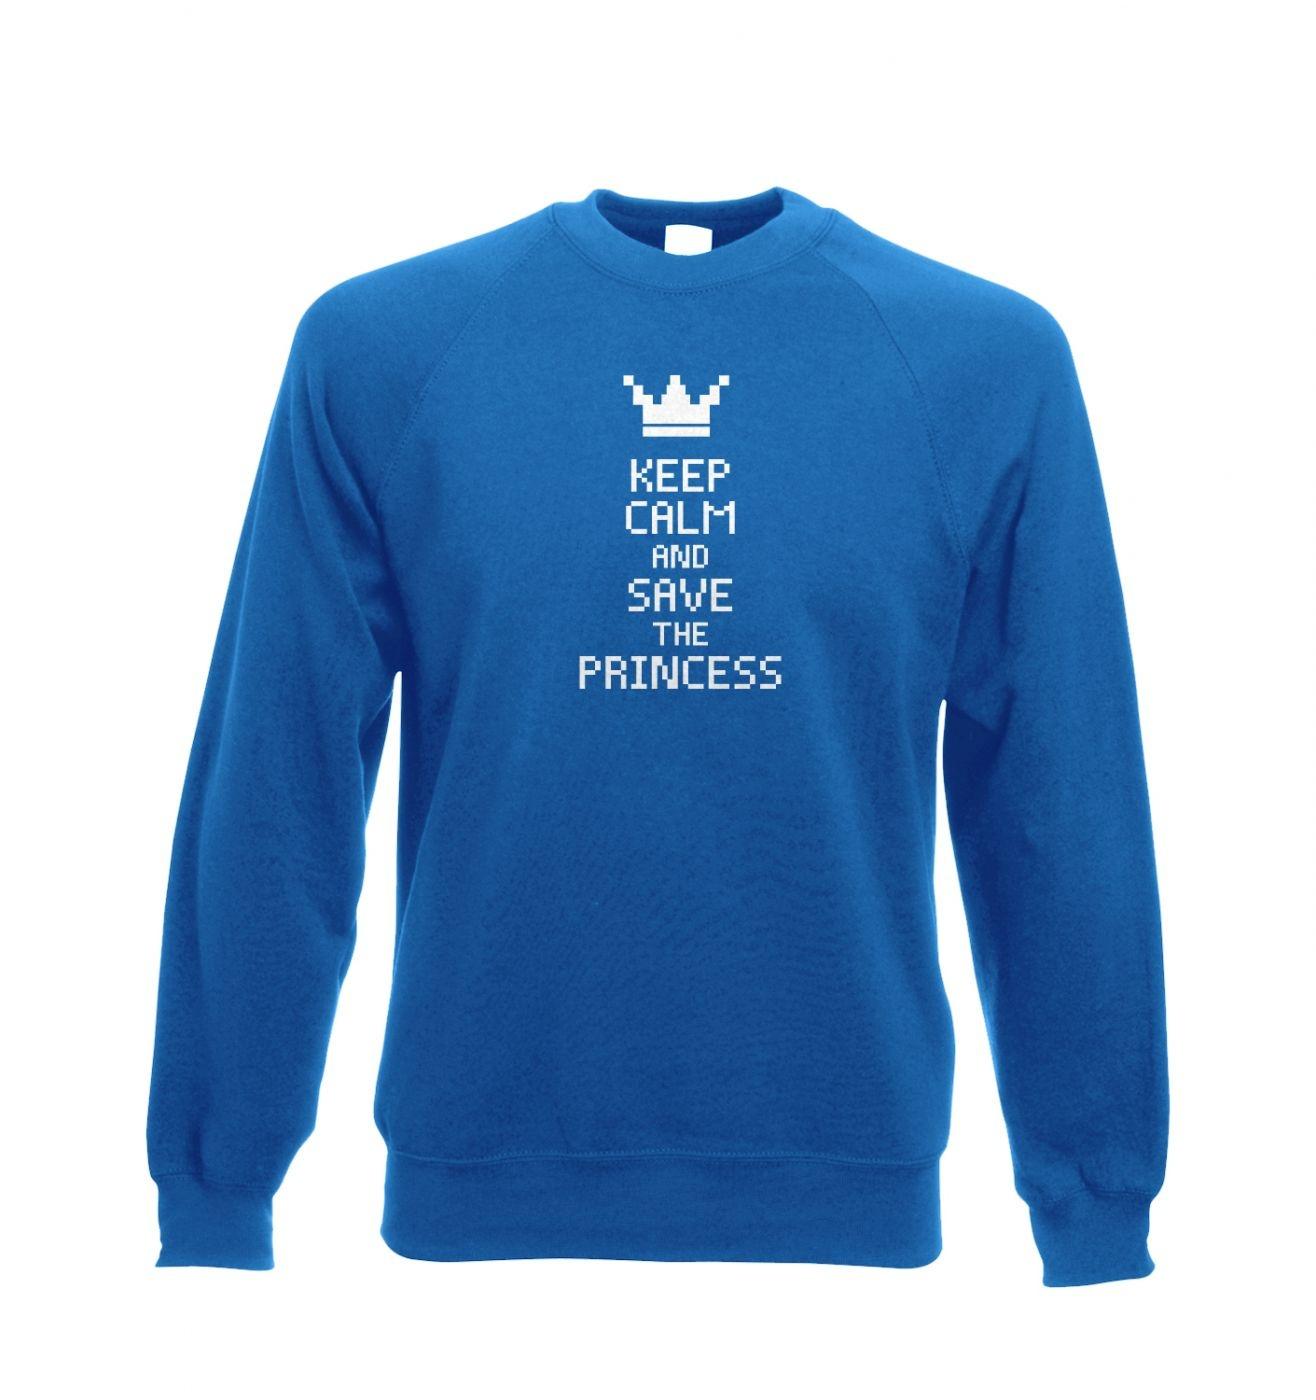 Keep Calm and Save The Princess crewneck sweatshirt